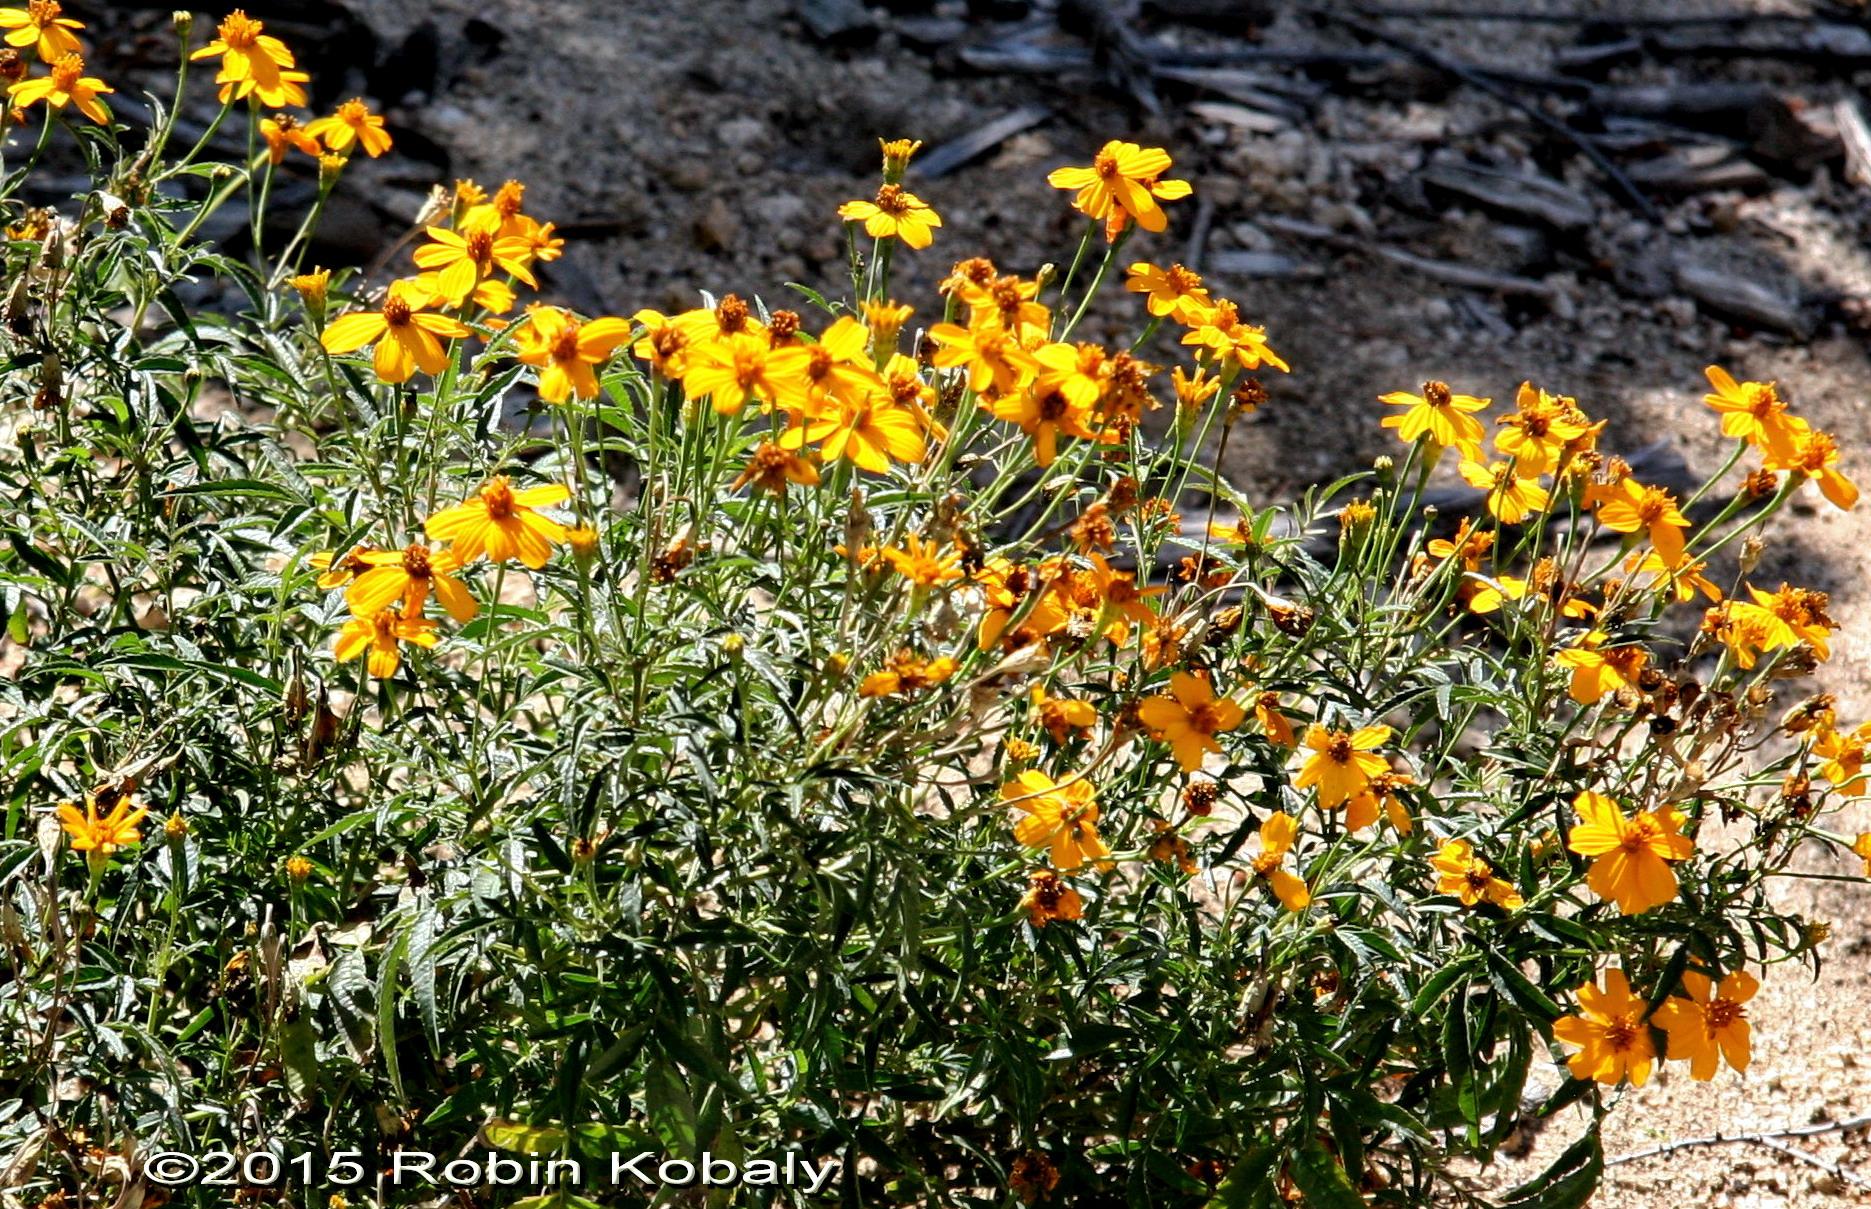 Aromatic Flower Daisy Family Flowers Healthy